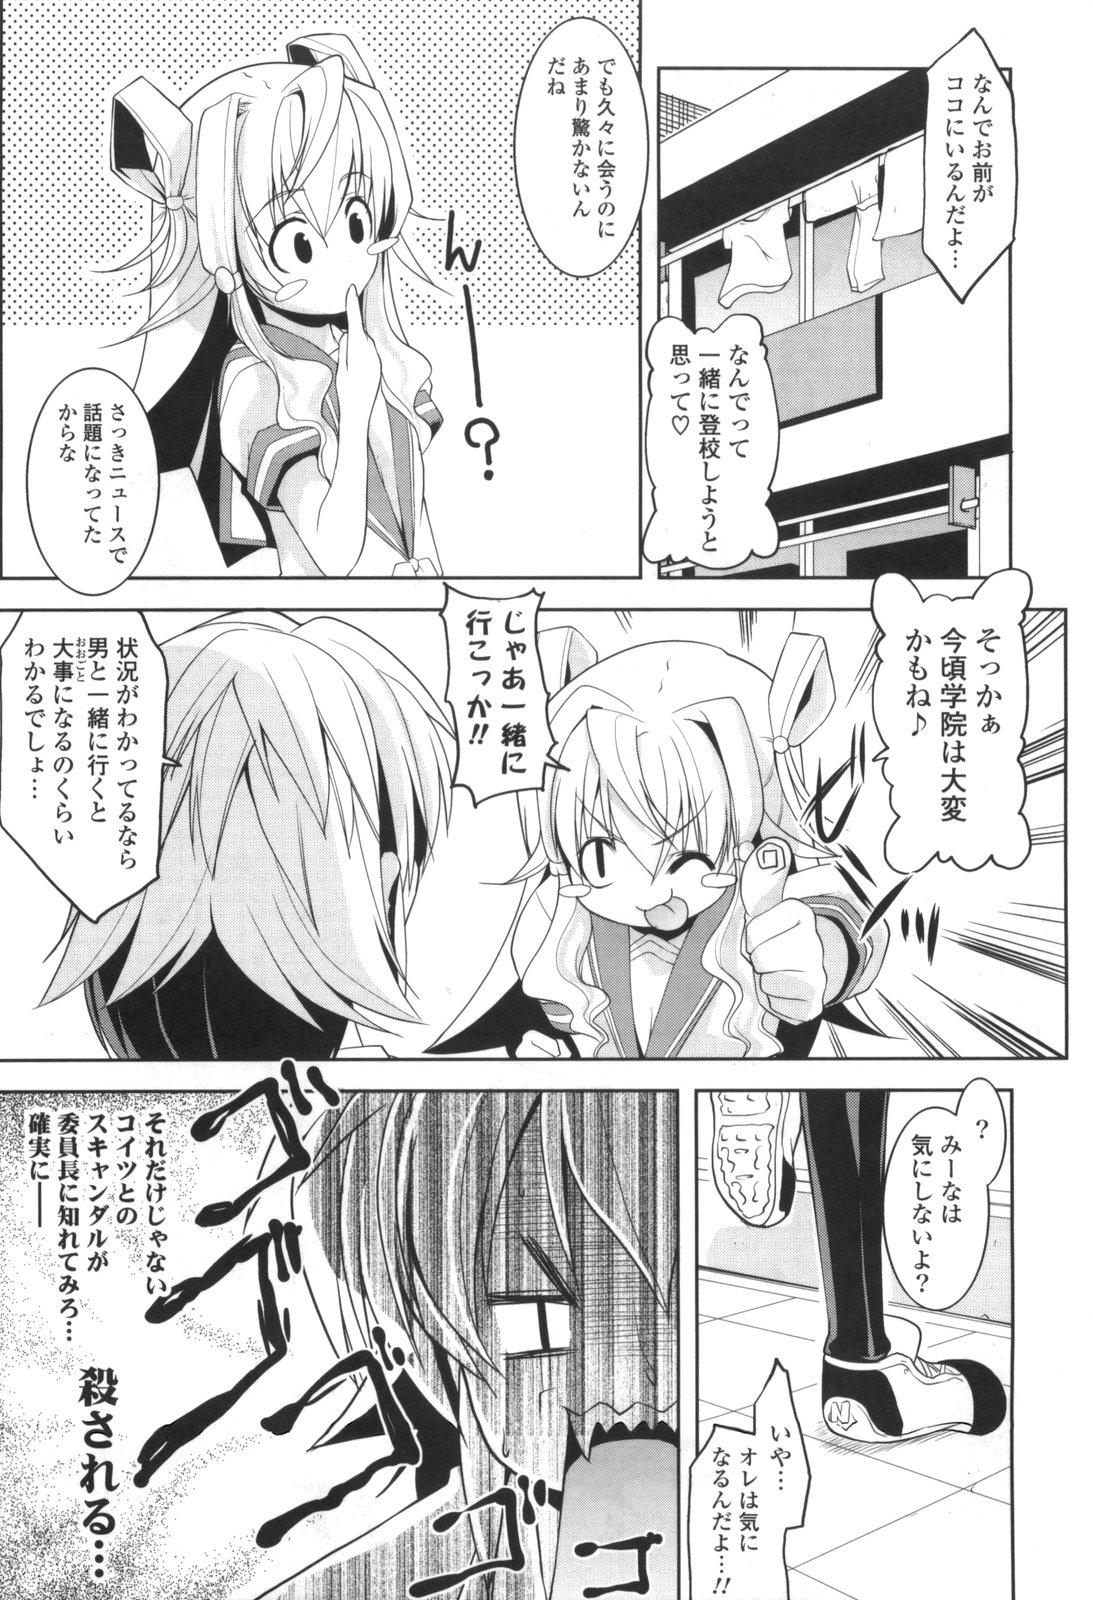 [Gyonikun] Gosyujin-sama Senyou!? Ami-sama Senyou 82